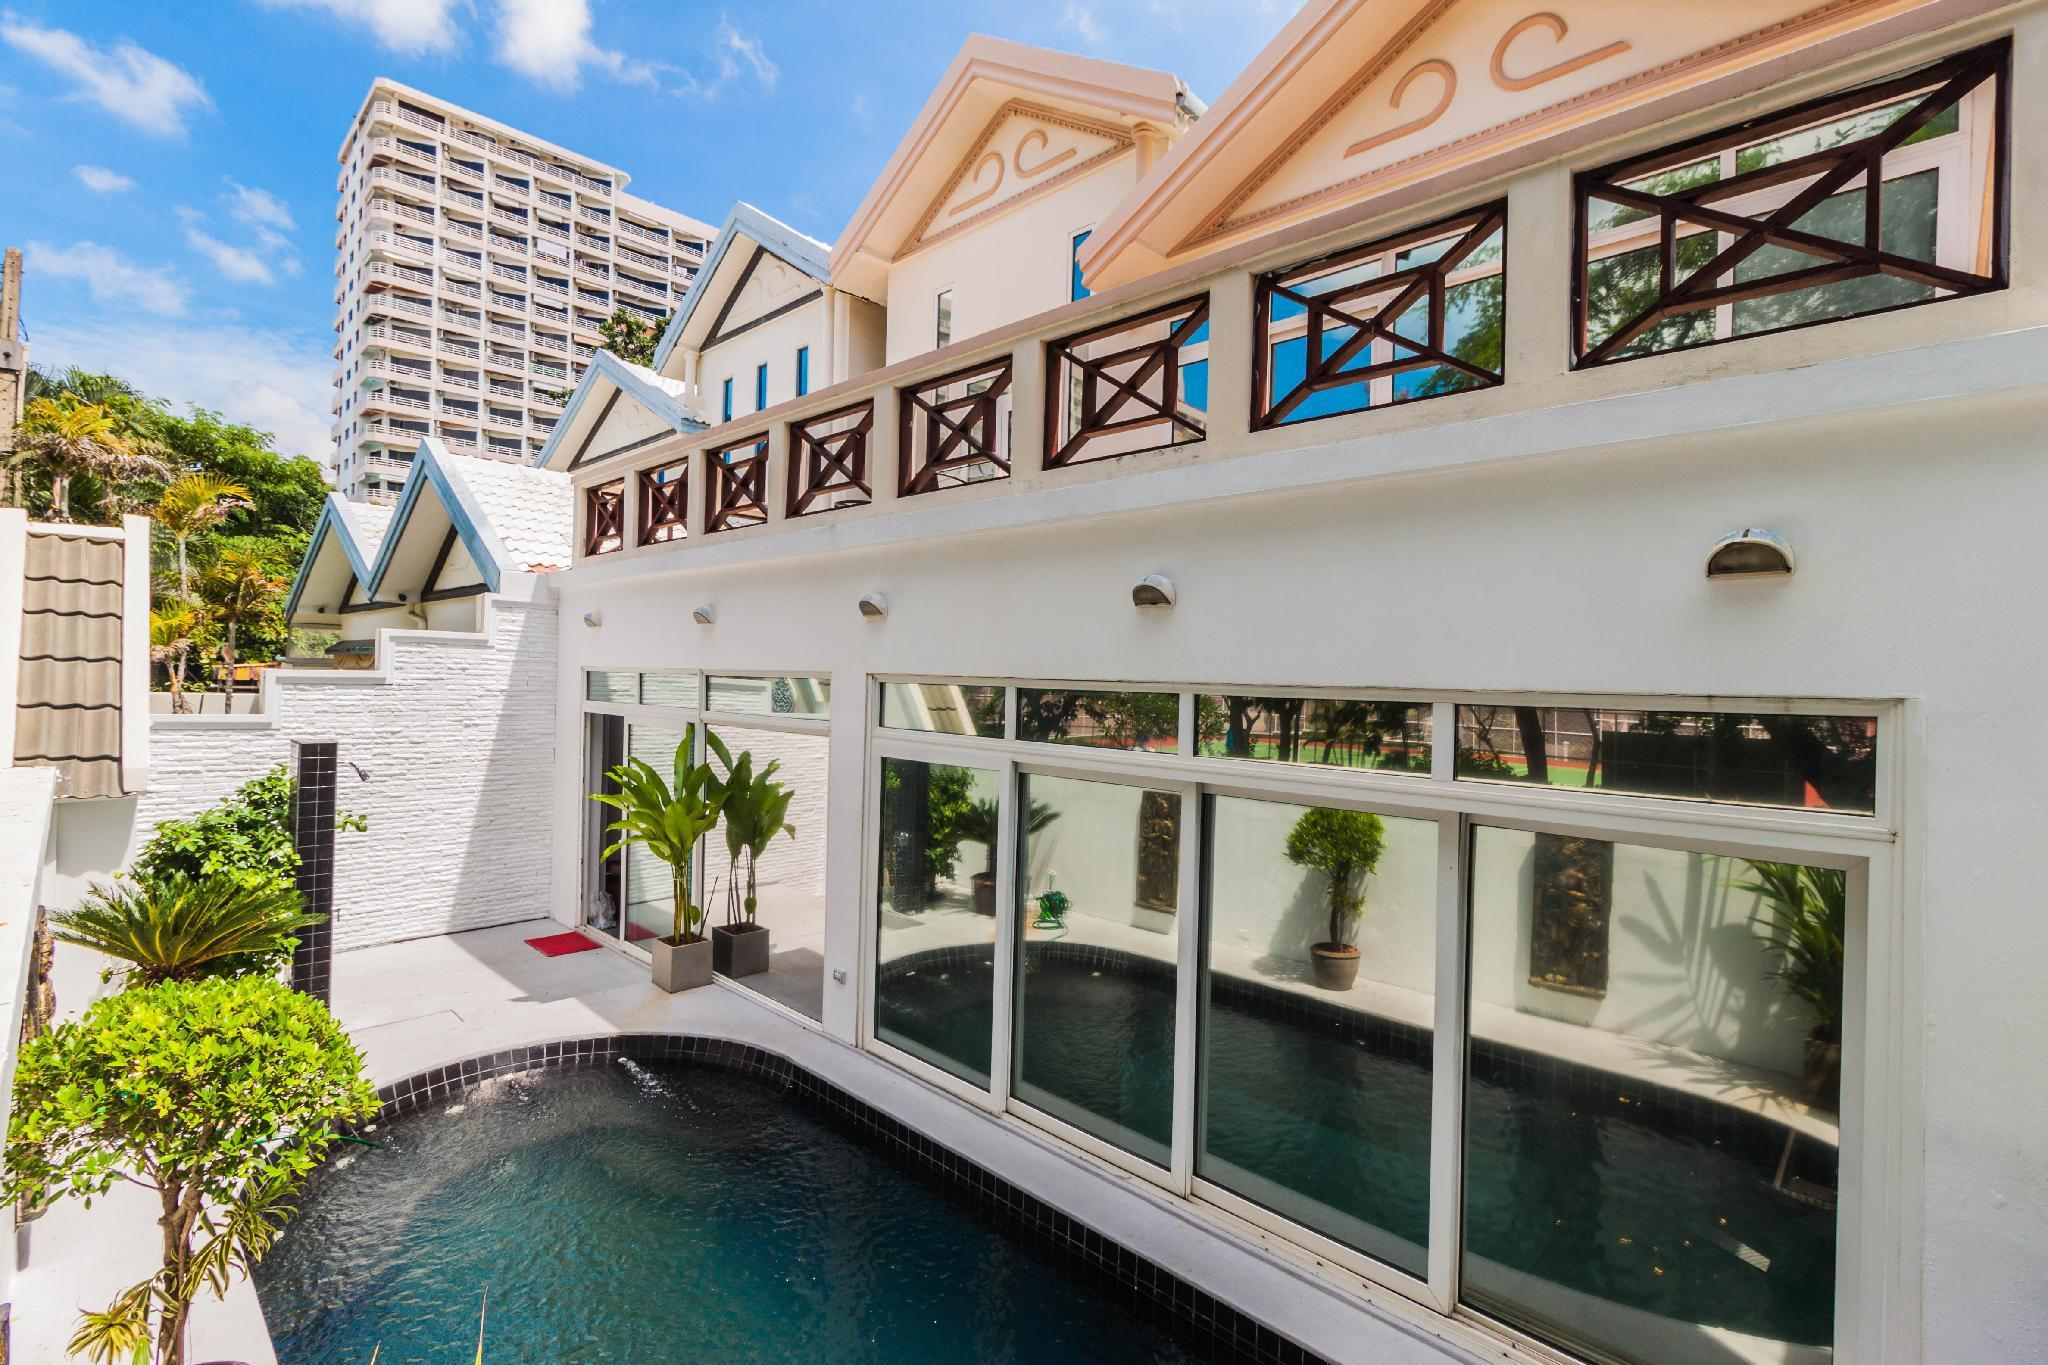 Jomtien Palace Pool Villa By Pattaya Sunny Rentals จอมเทียน พาเลซ พูล วิลลา บาย พัทยา ซันนี เรนทัล